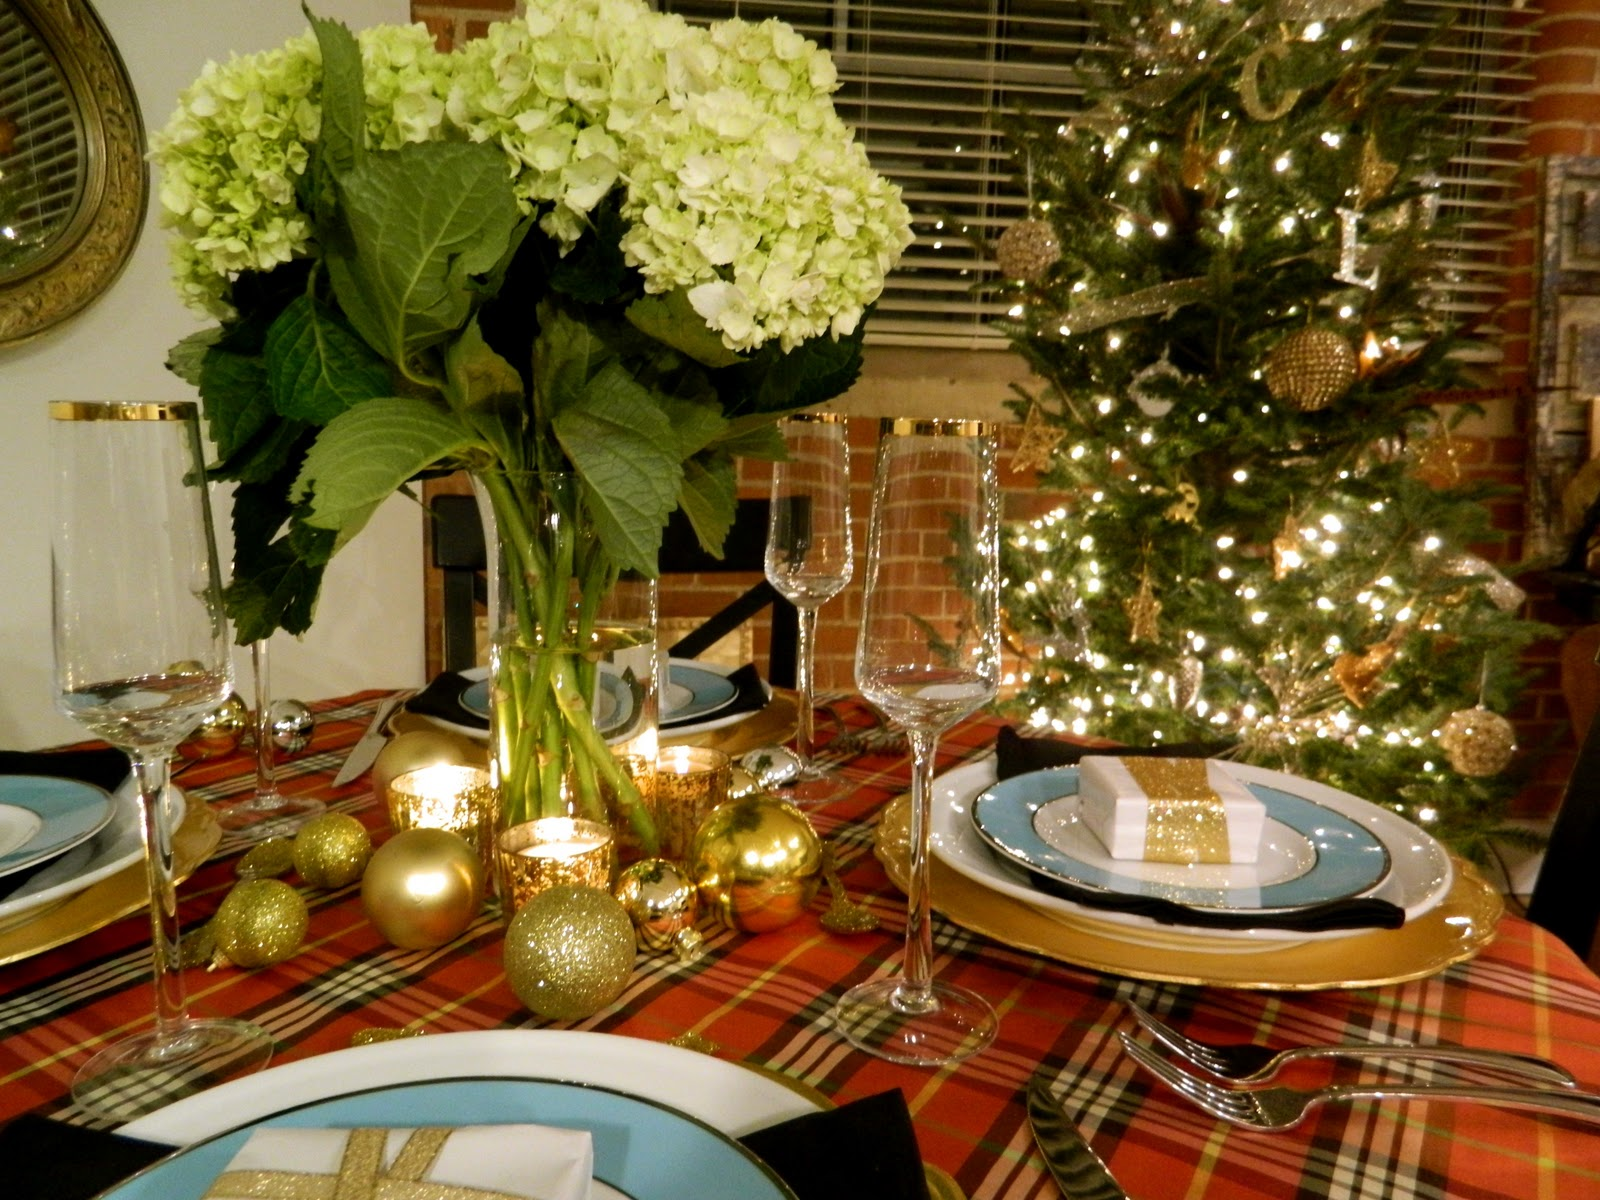 Sadie Stella S S Plaid Christmas Tablescape